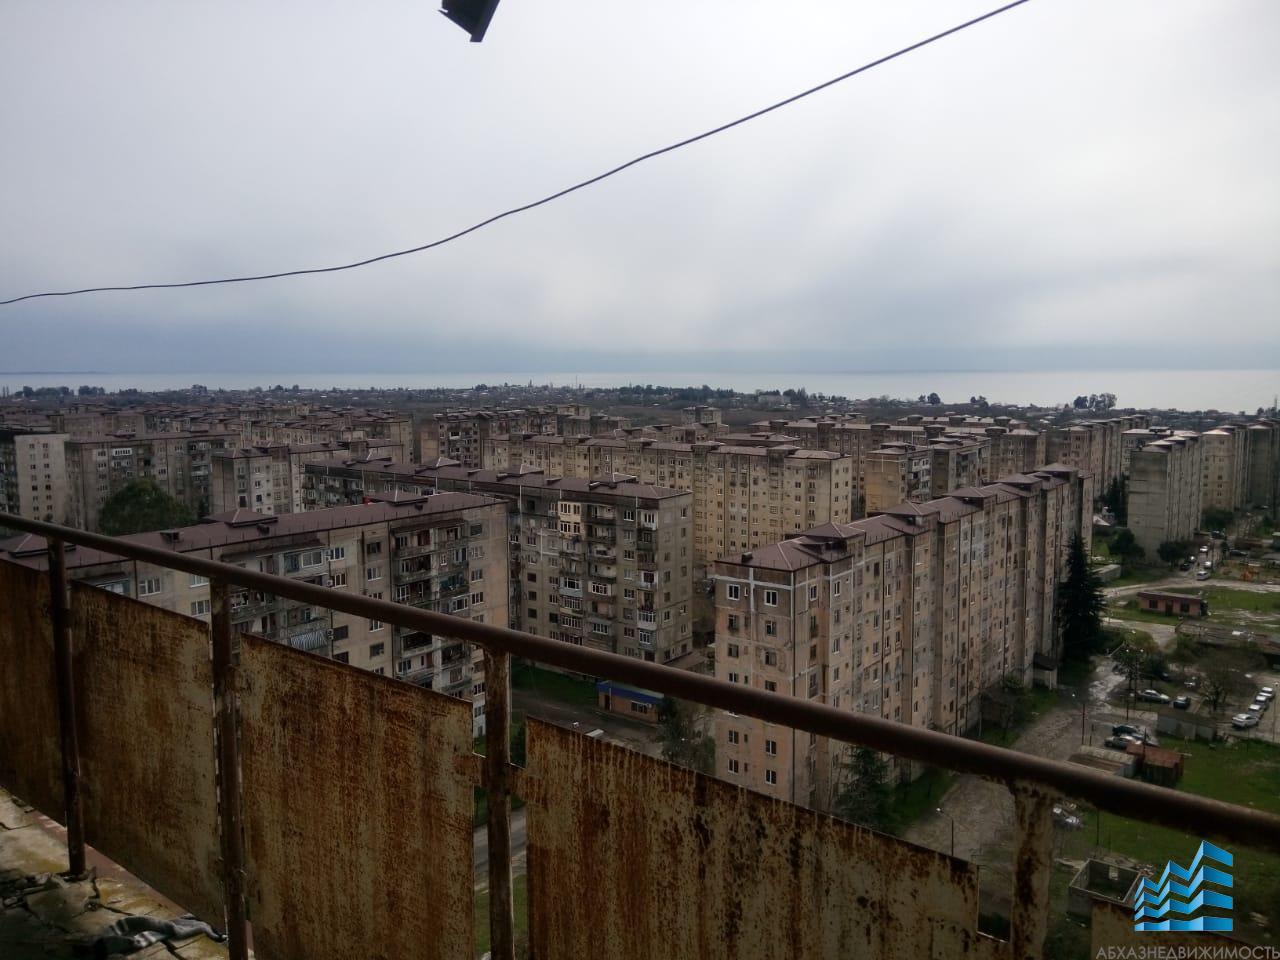 2-комнатная квартира за 700 тыс.руб